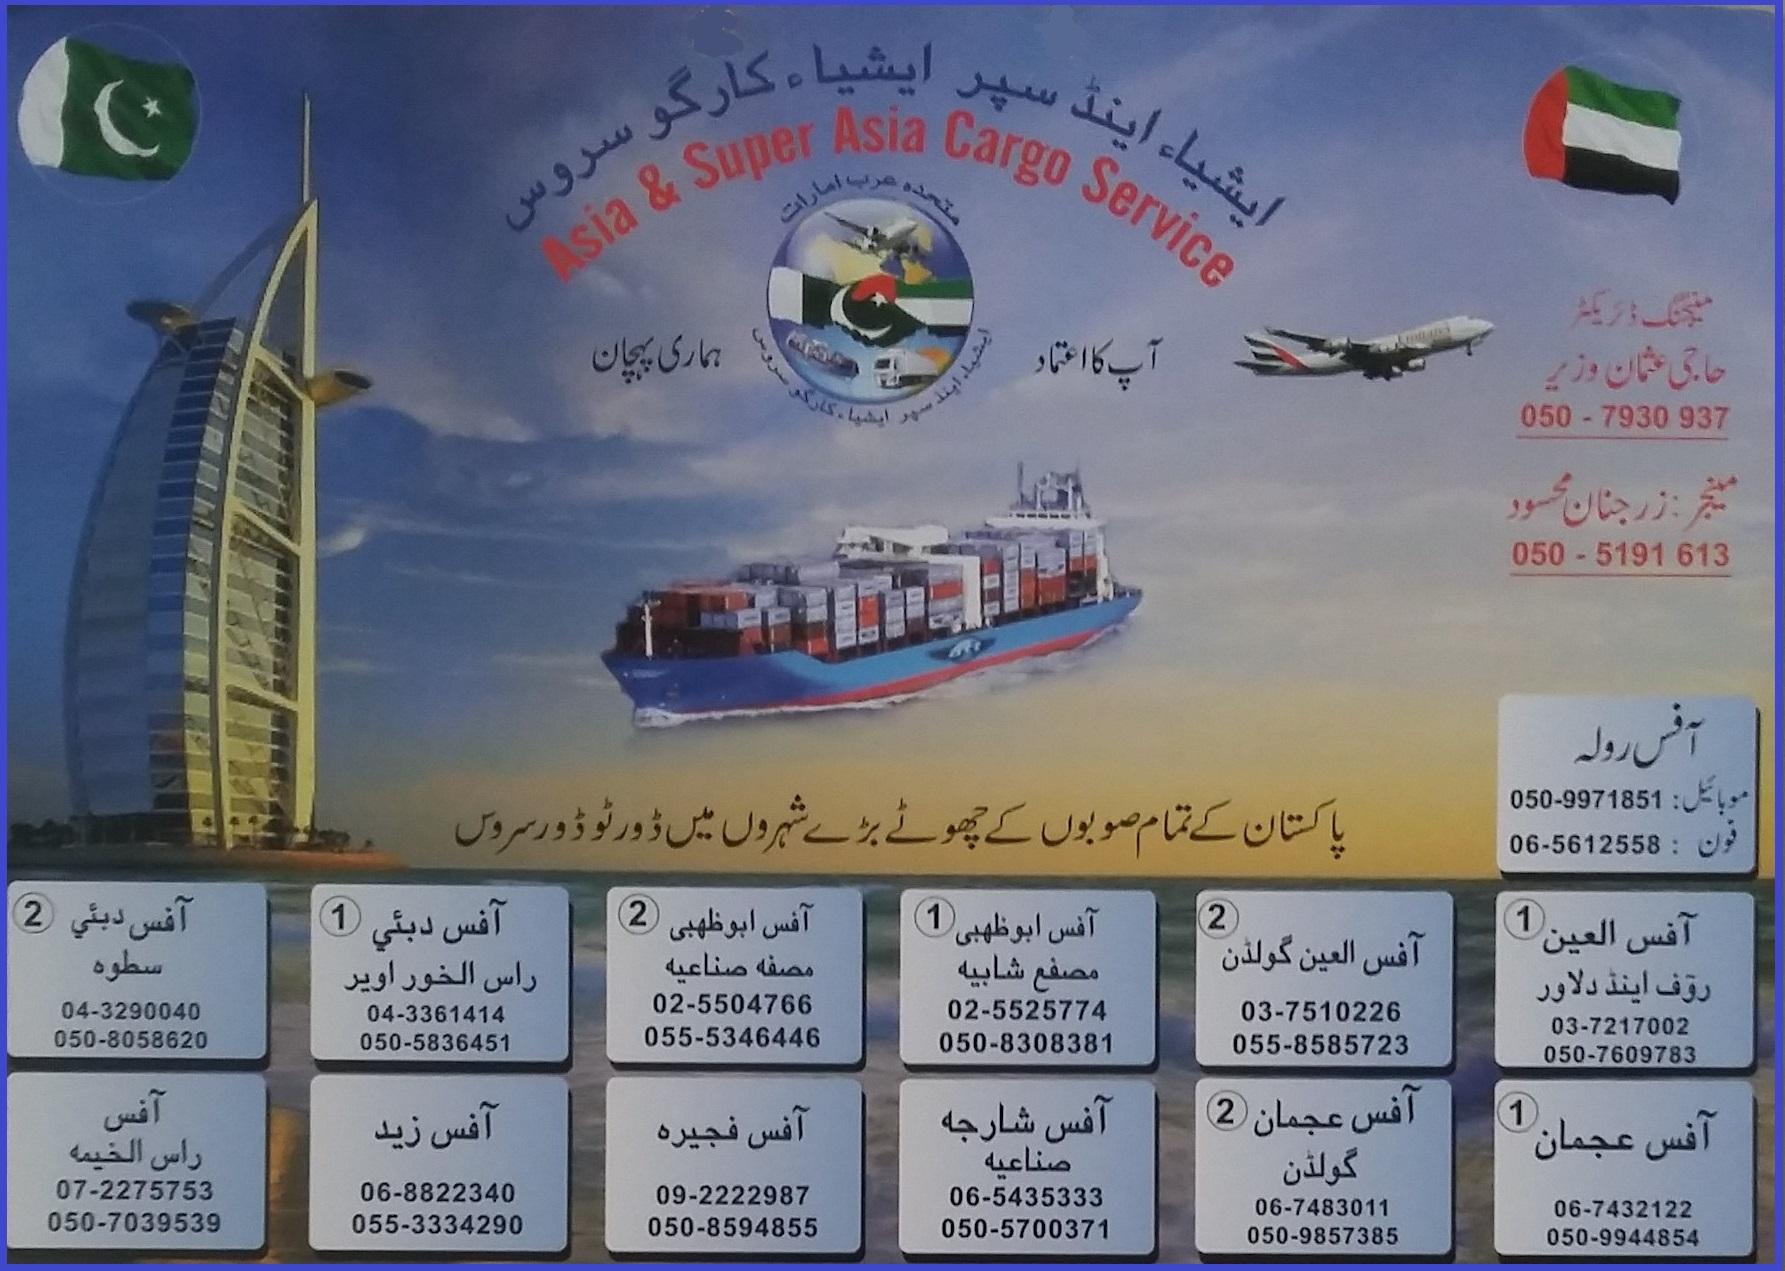 Asia And Super Asia Cargo Service